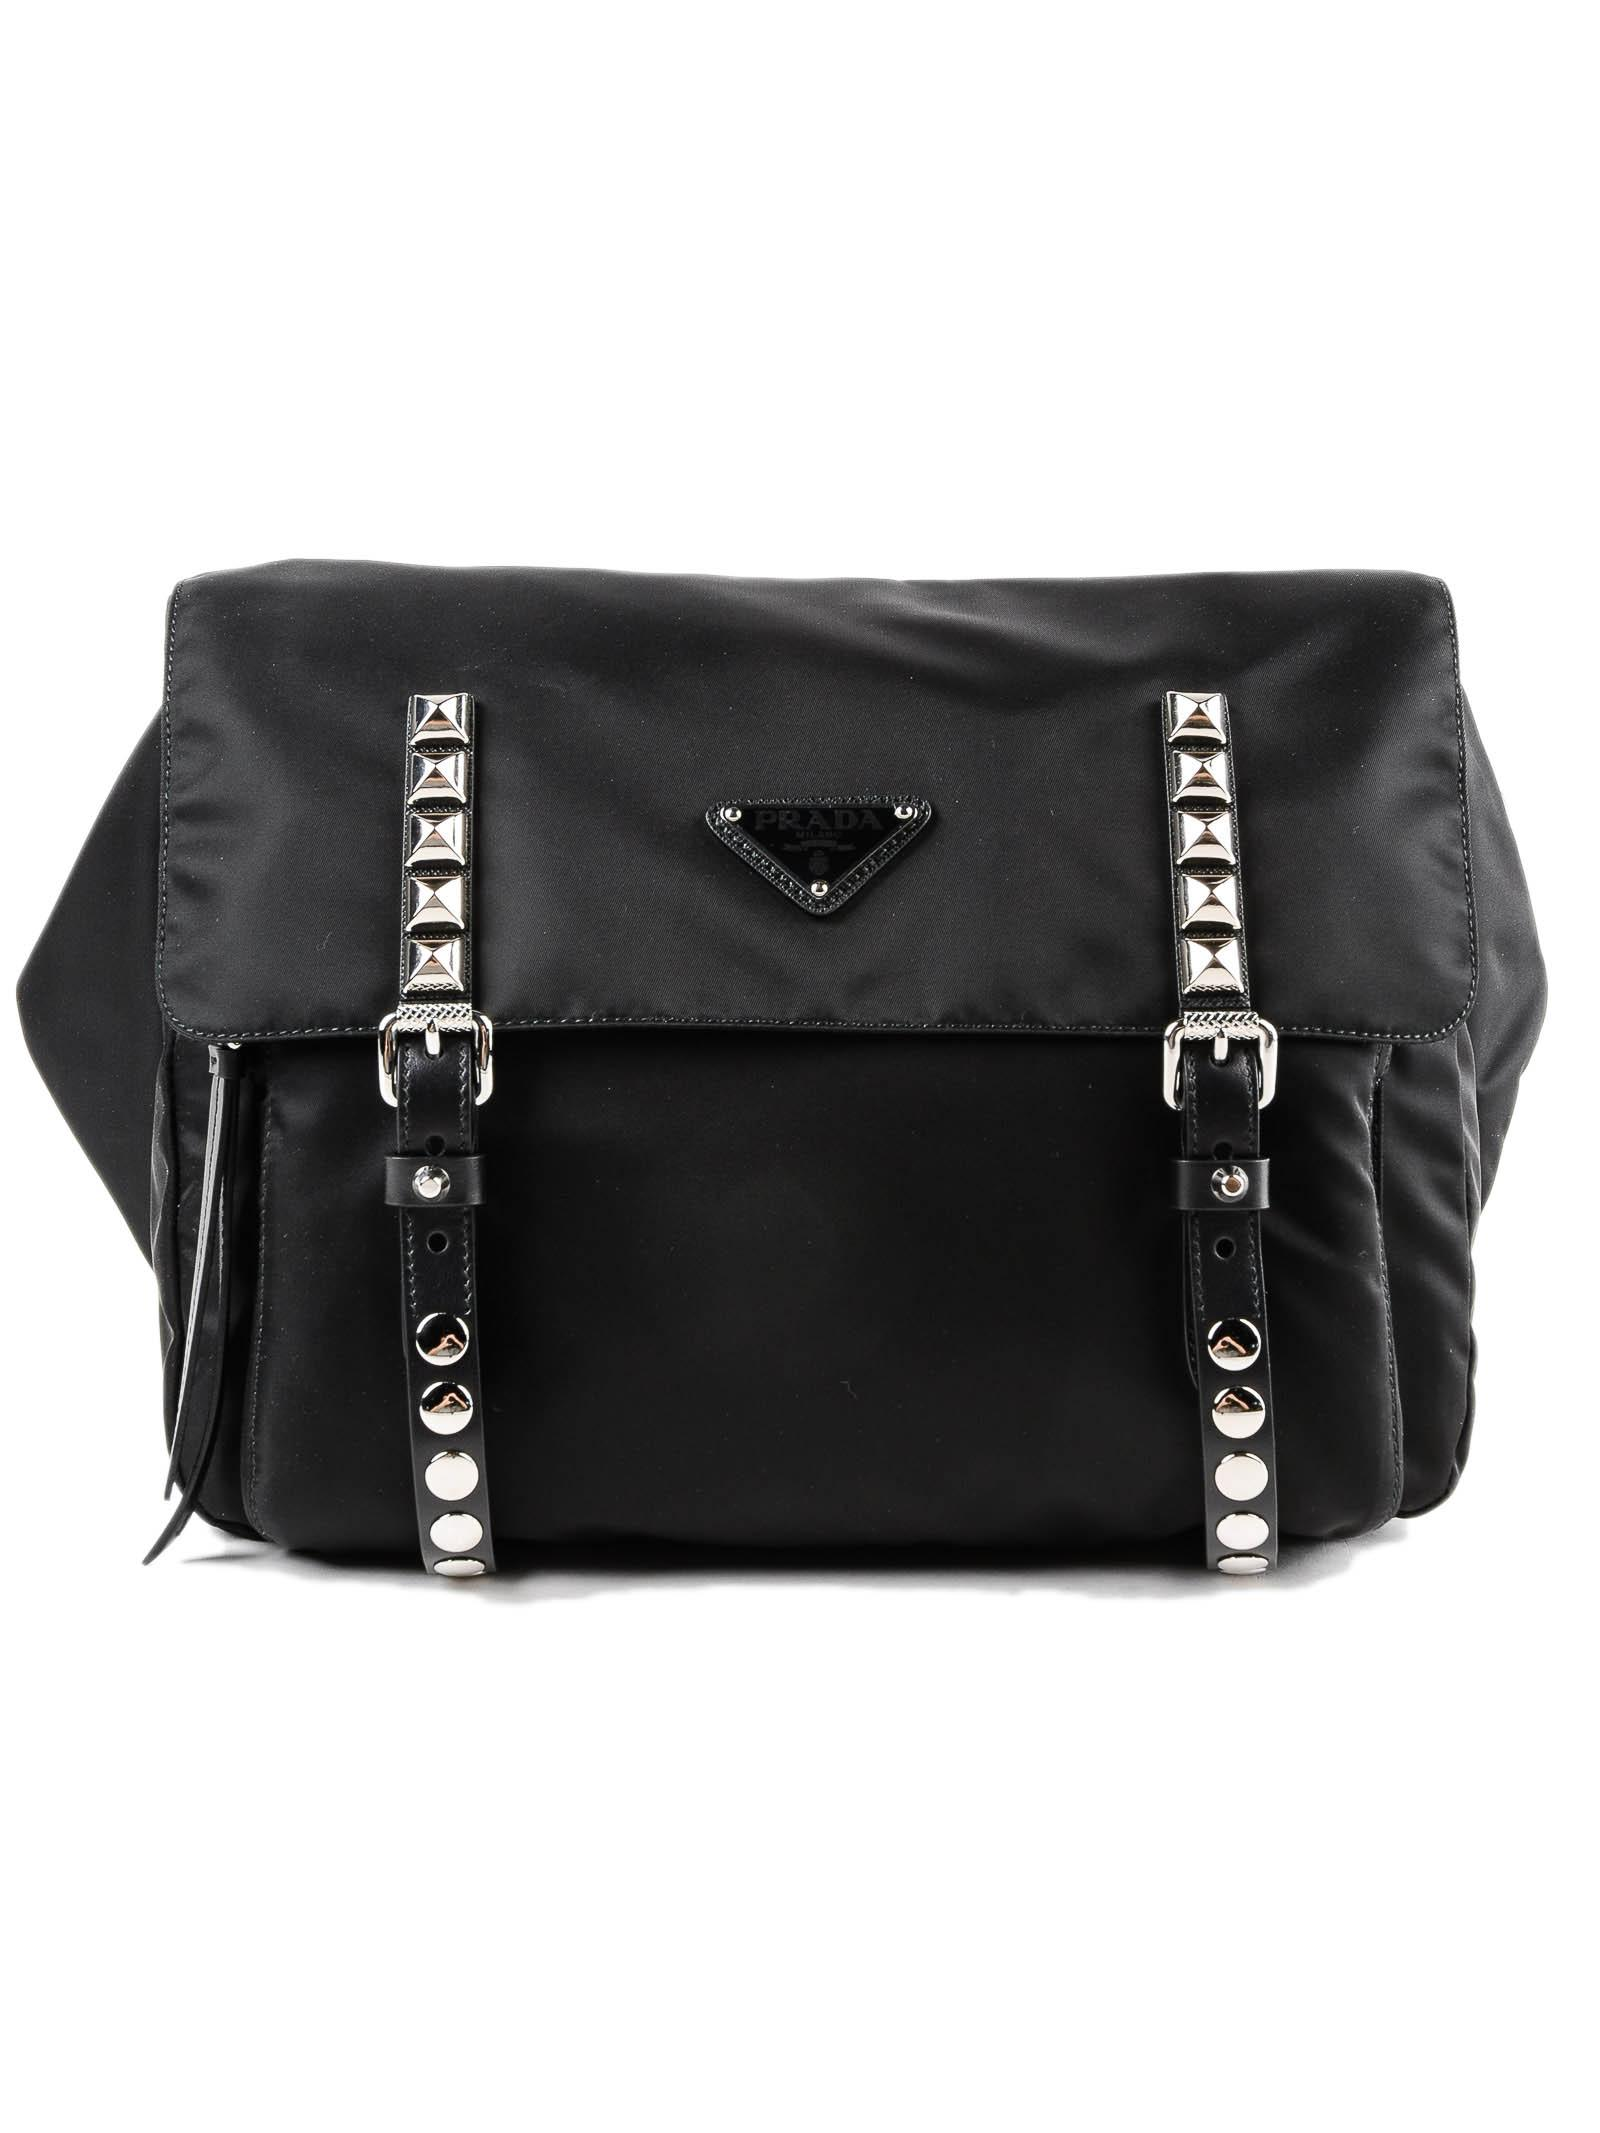 6c7d48c63409 Lyst - Prada Belt Bag New Vela in Black